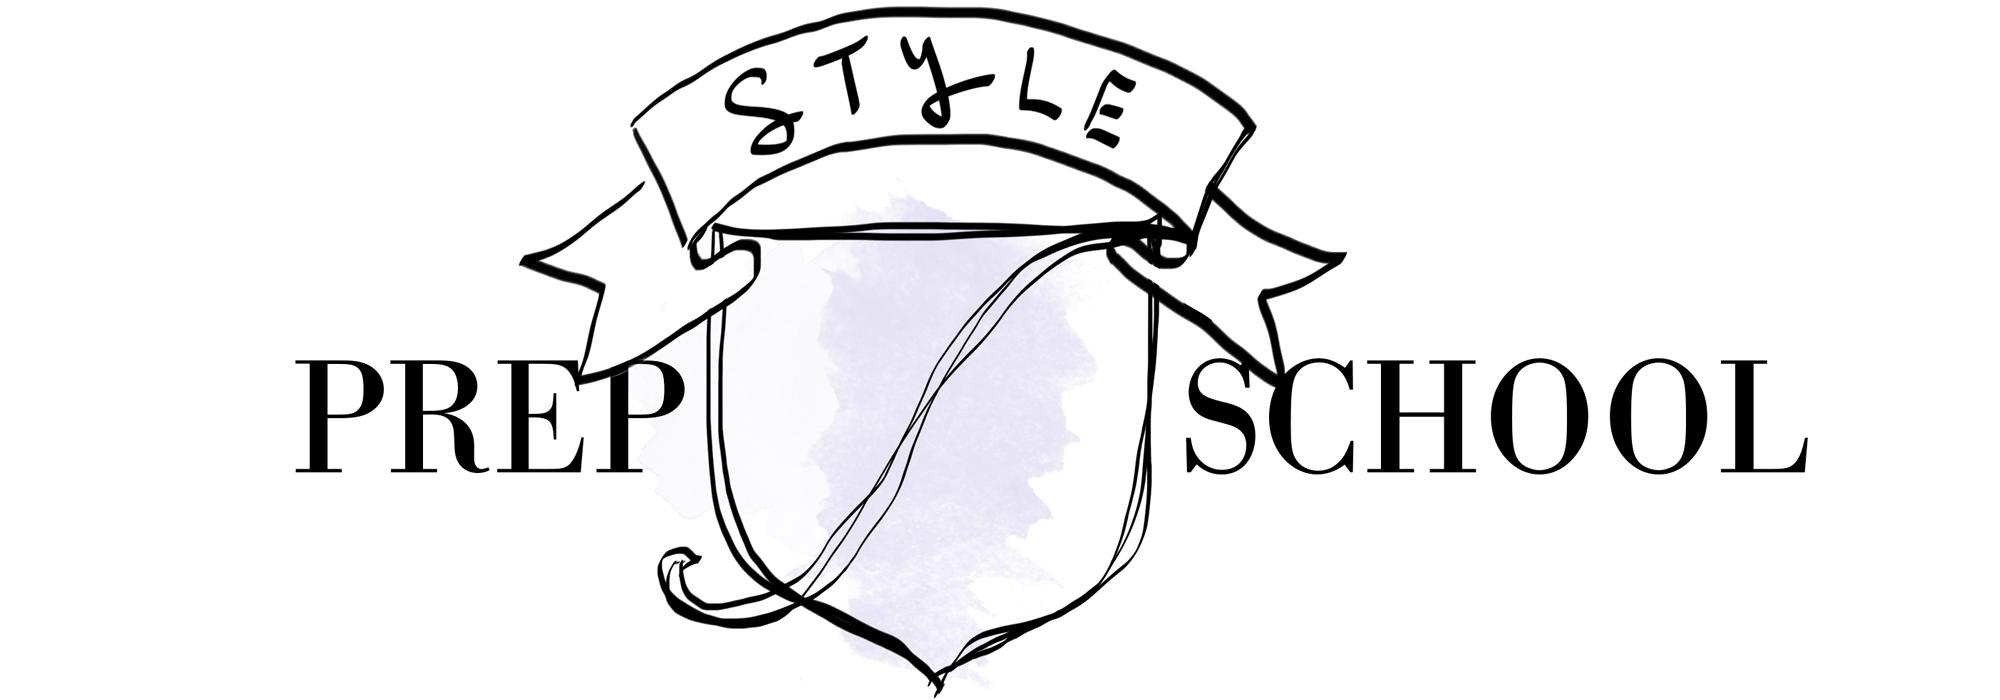 style-prep-school.png